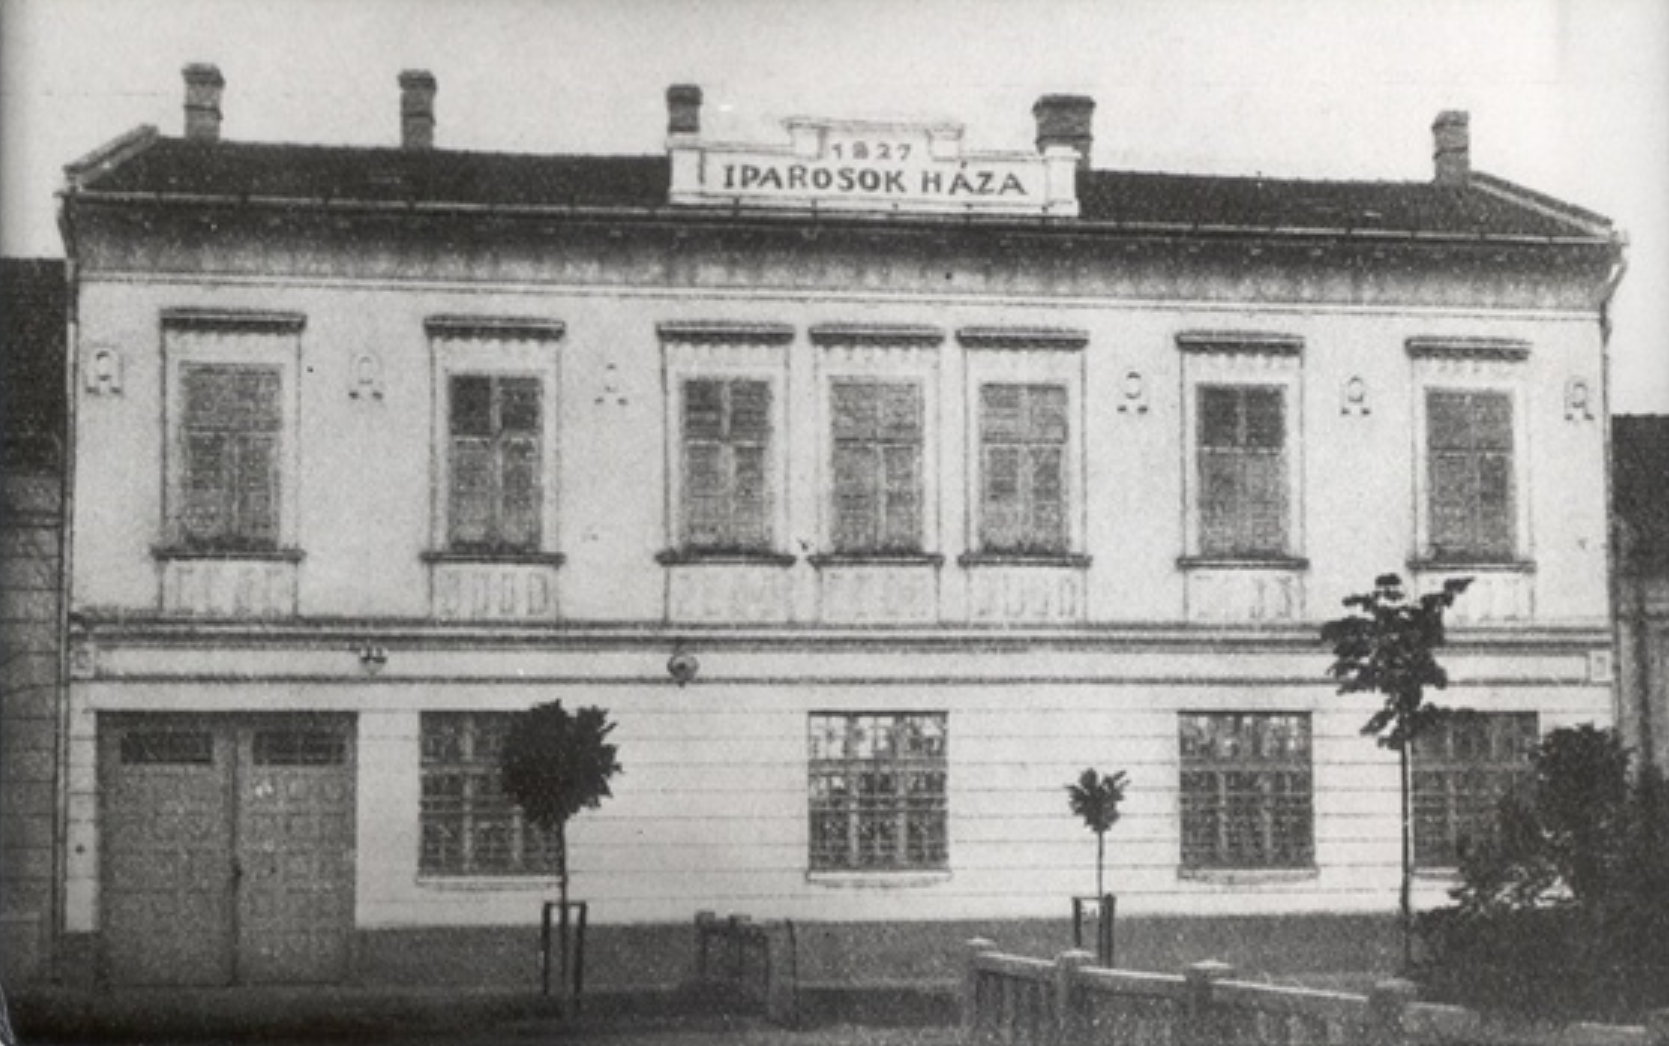 iparosok_haza_1.jpg